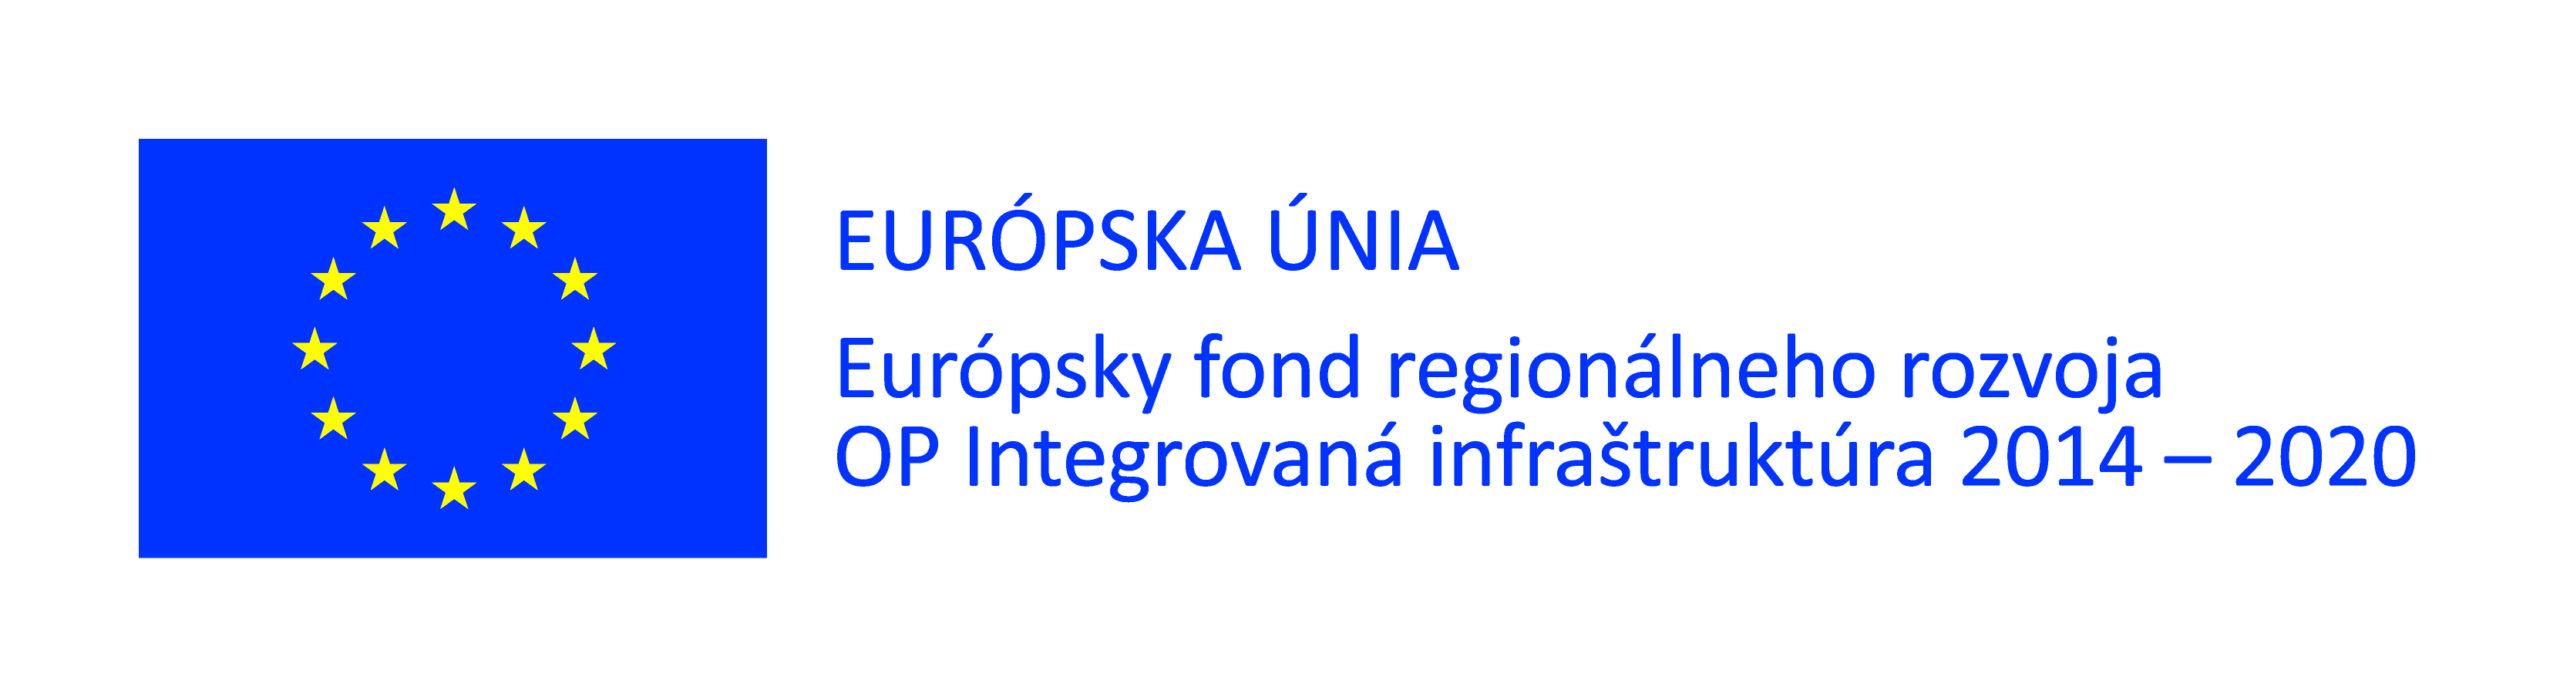 Gasparik projekty EU